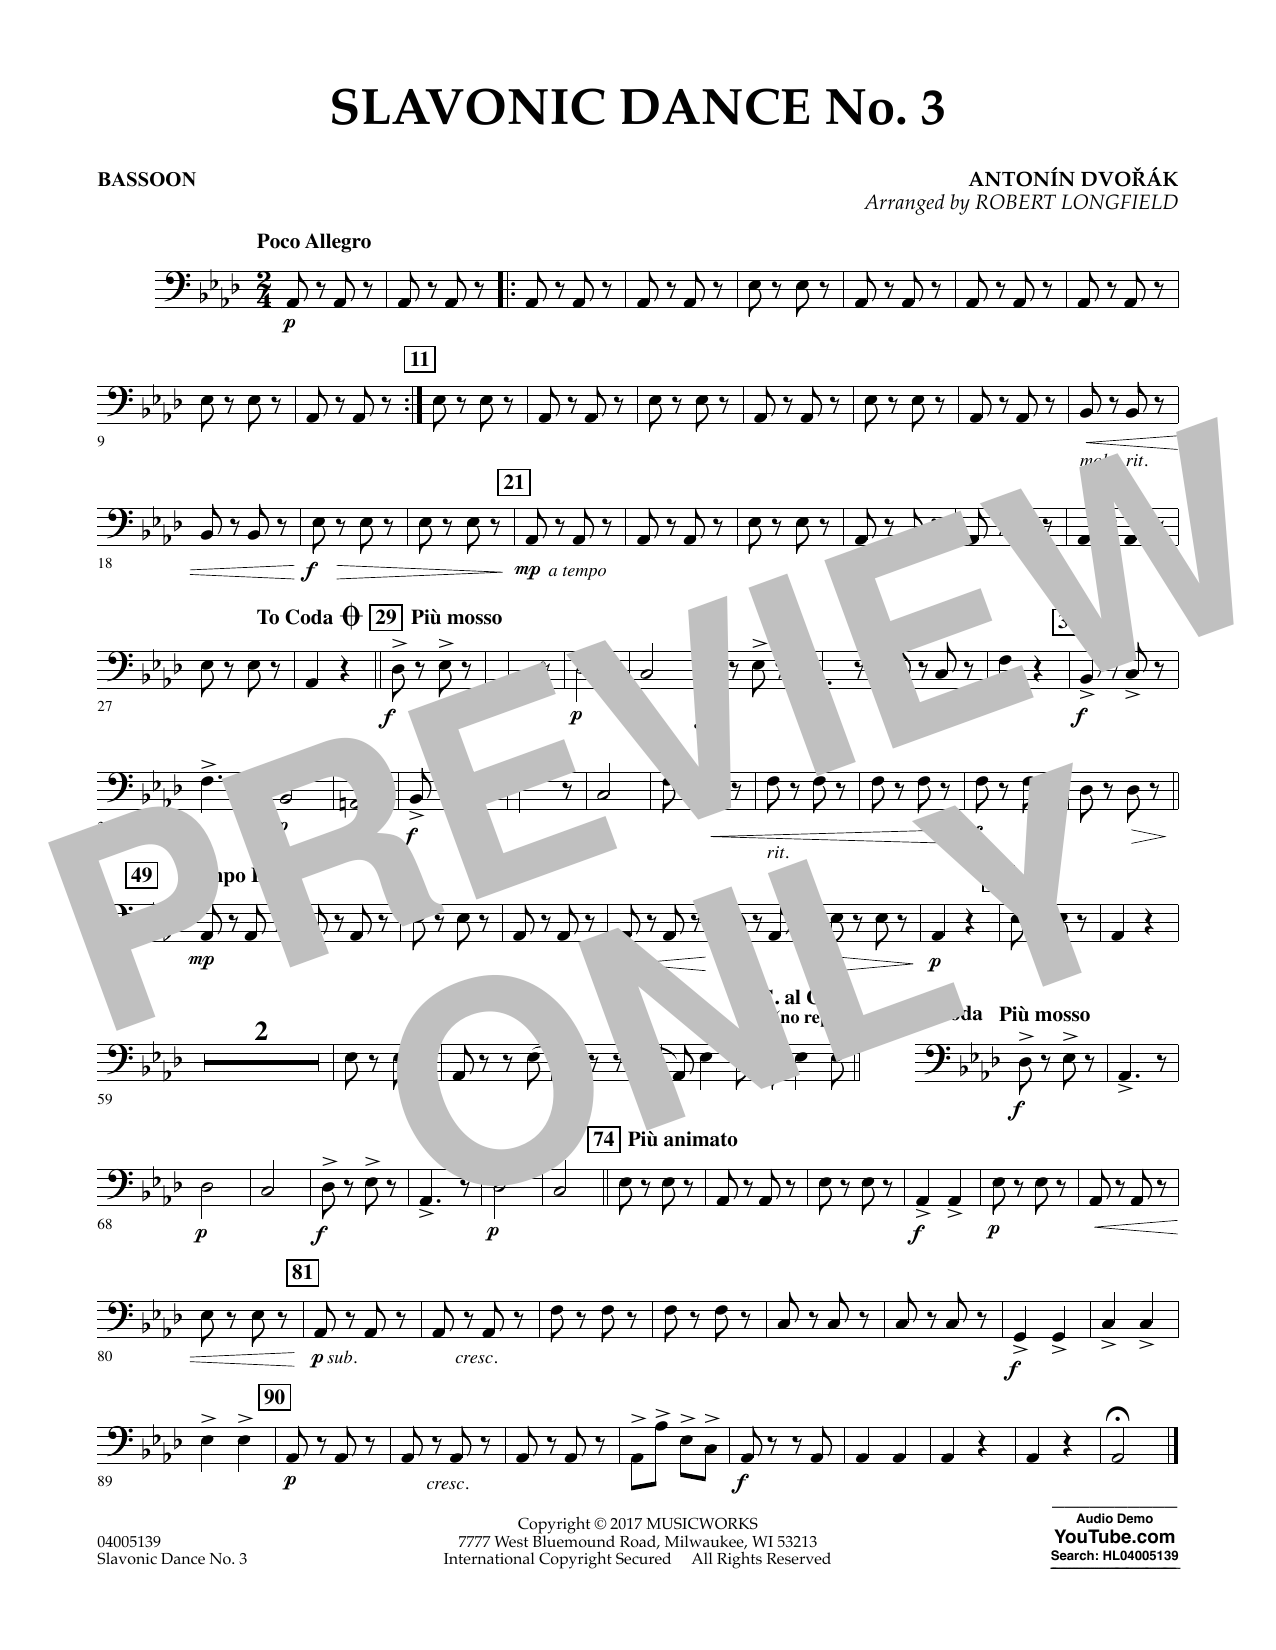 Slavonic Dance No. 3 - Bassoon Sheet Music